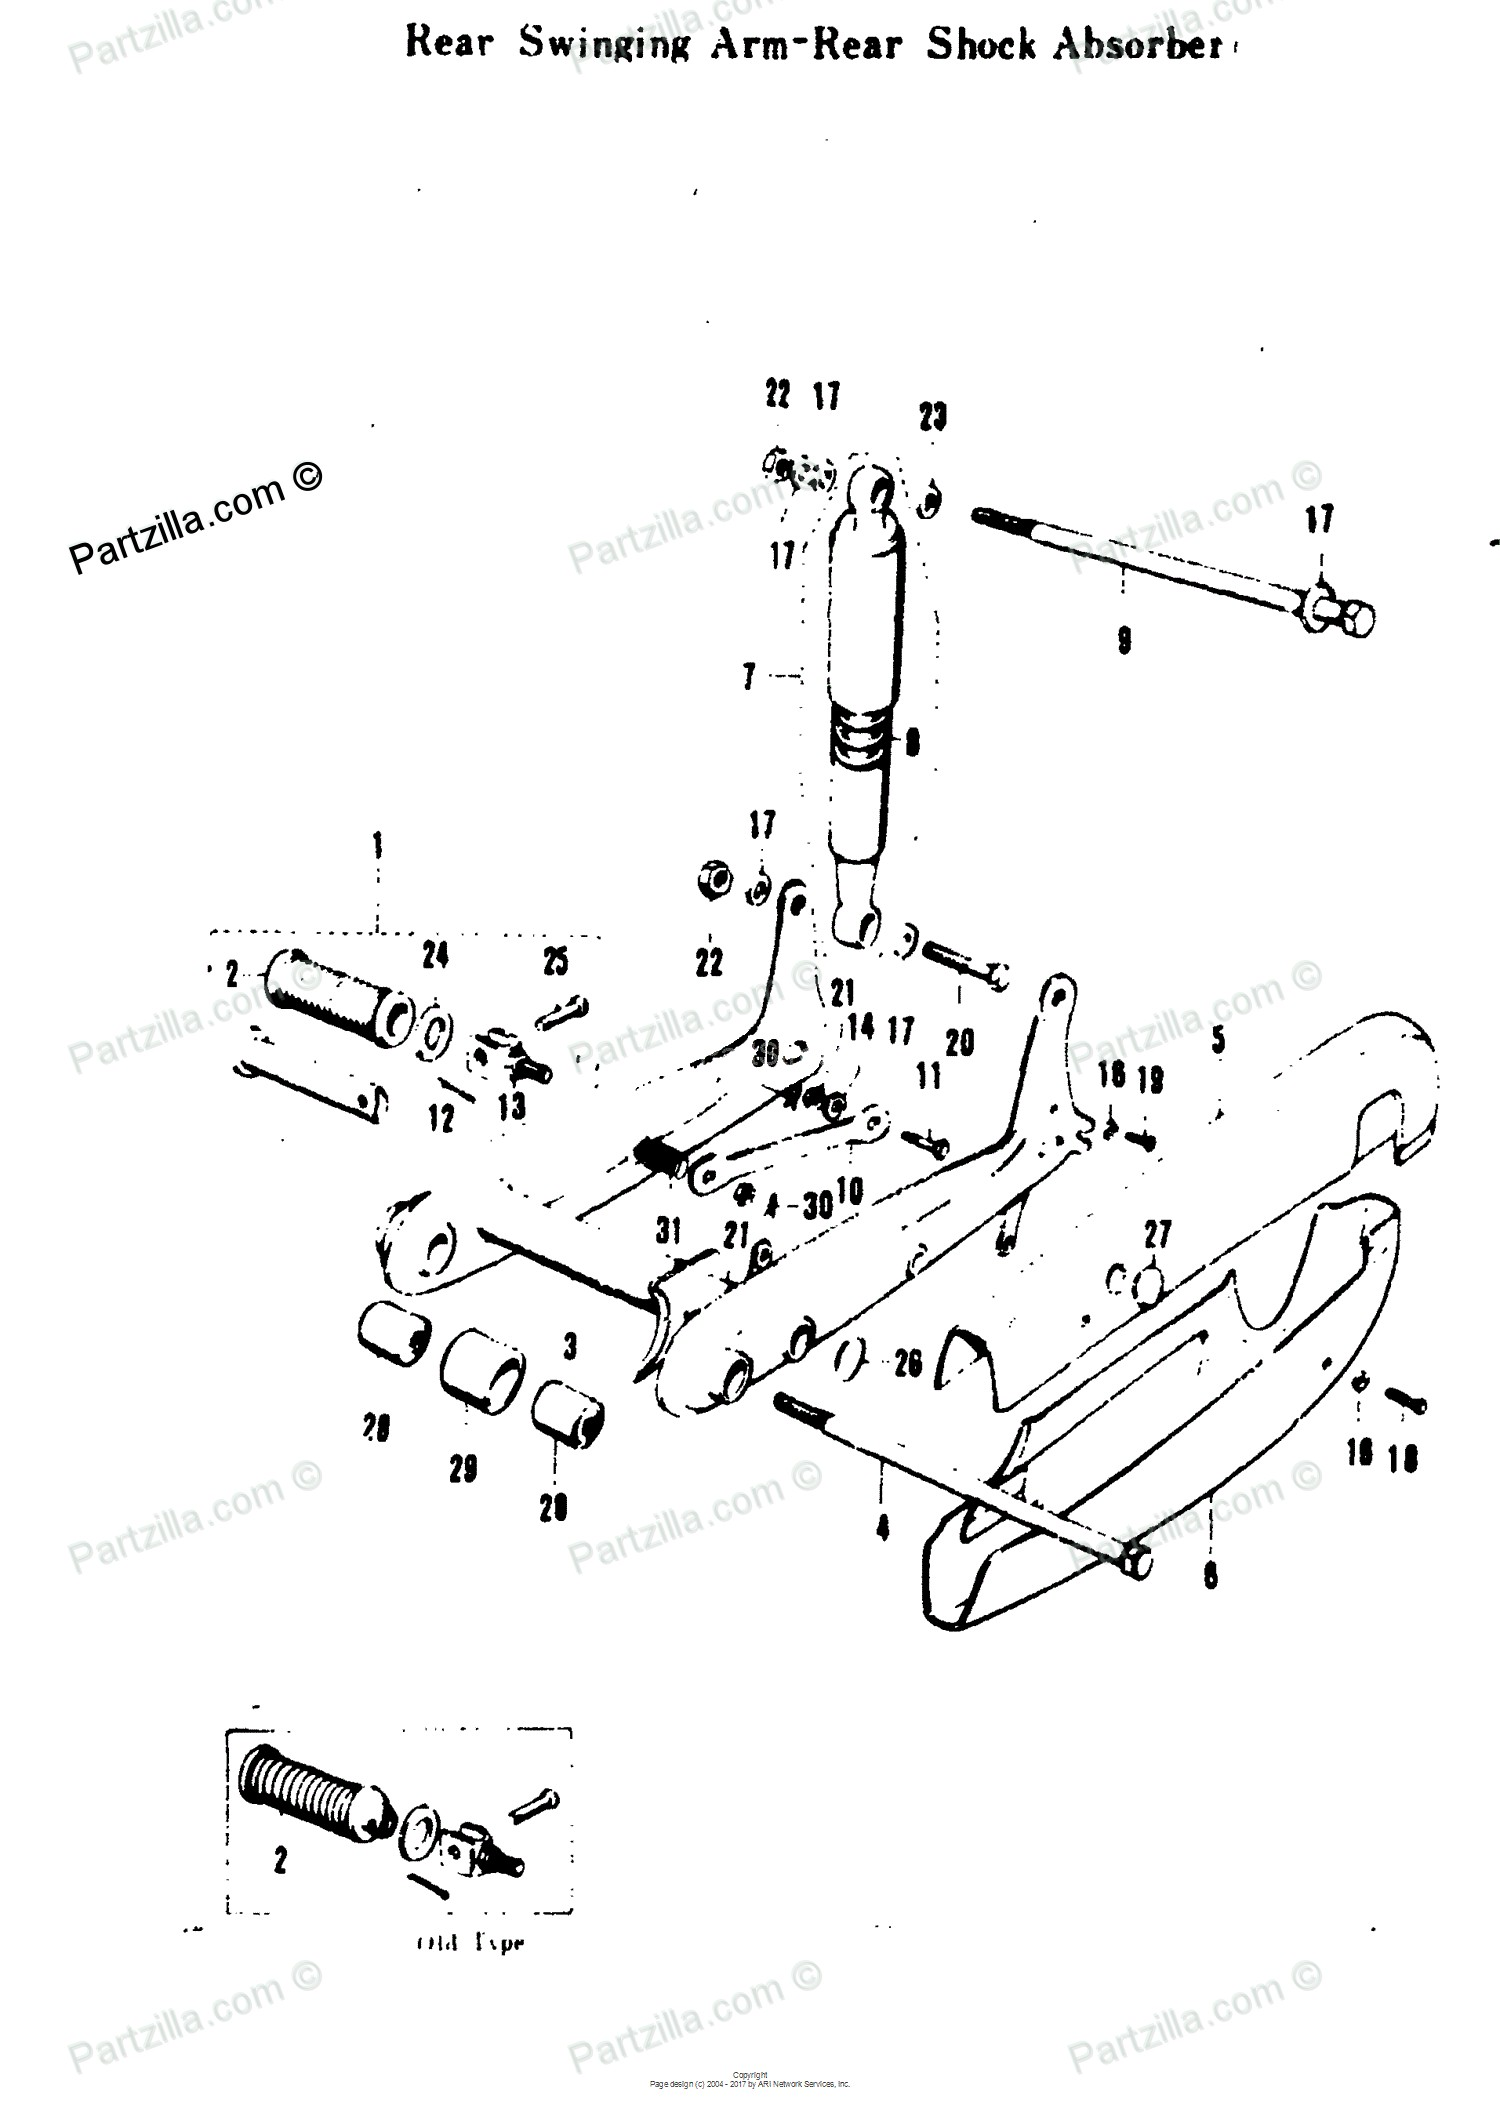 Car shock absorber diagram suzuki motorcycle 1969 oem parts diagram for rear swinging arm rear